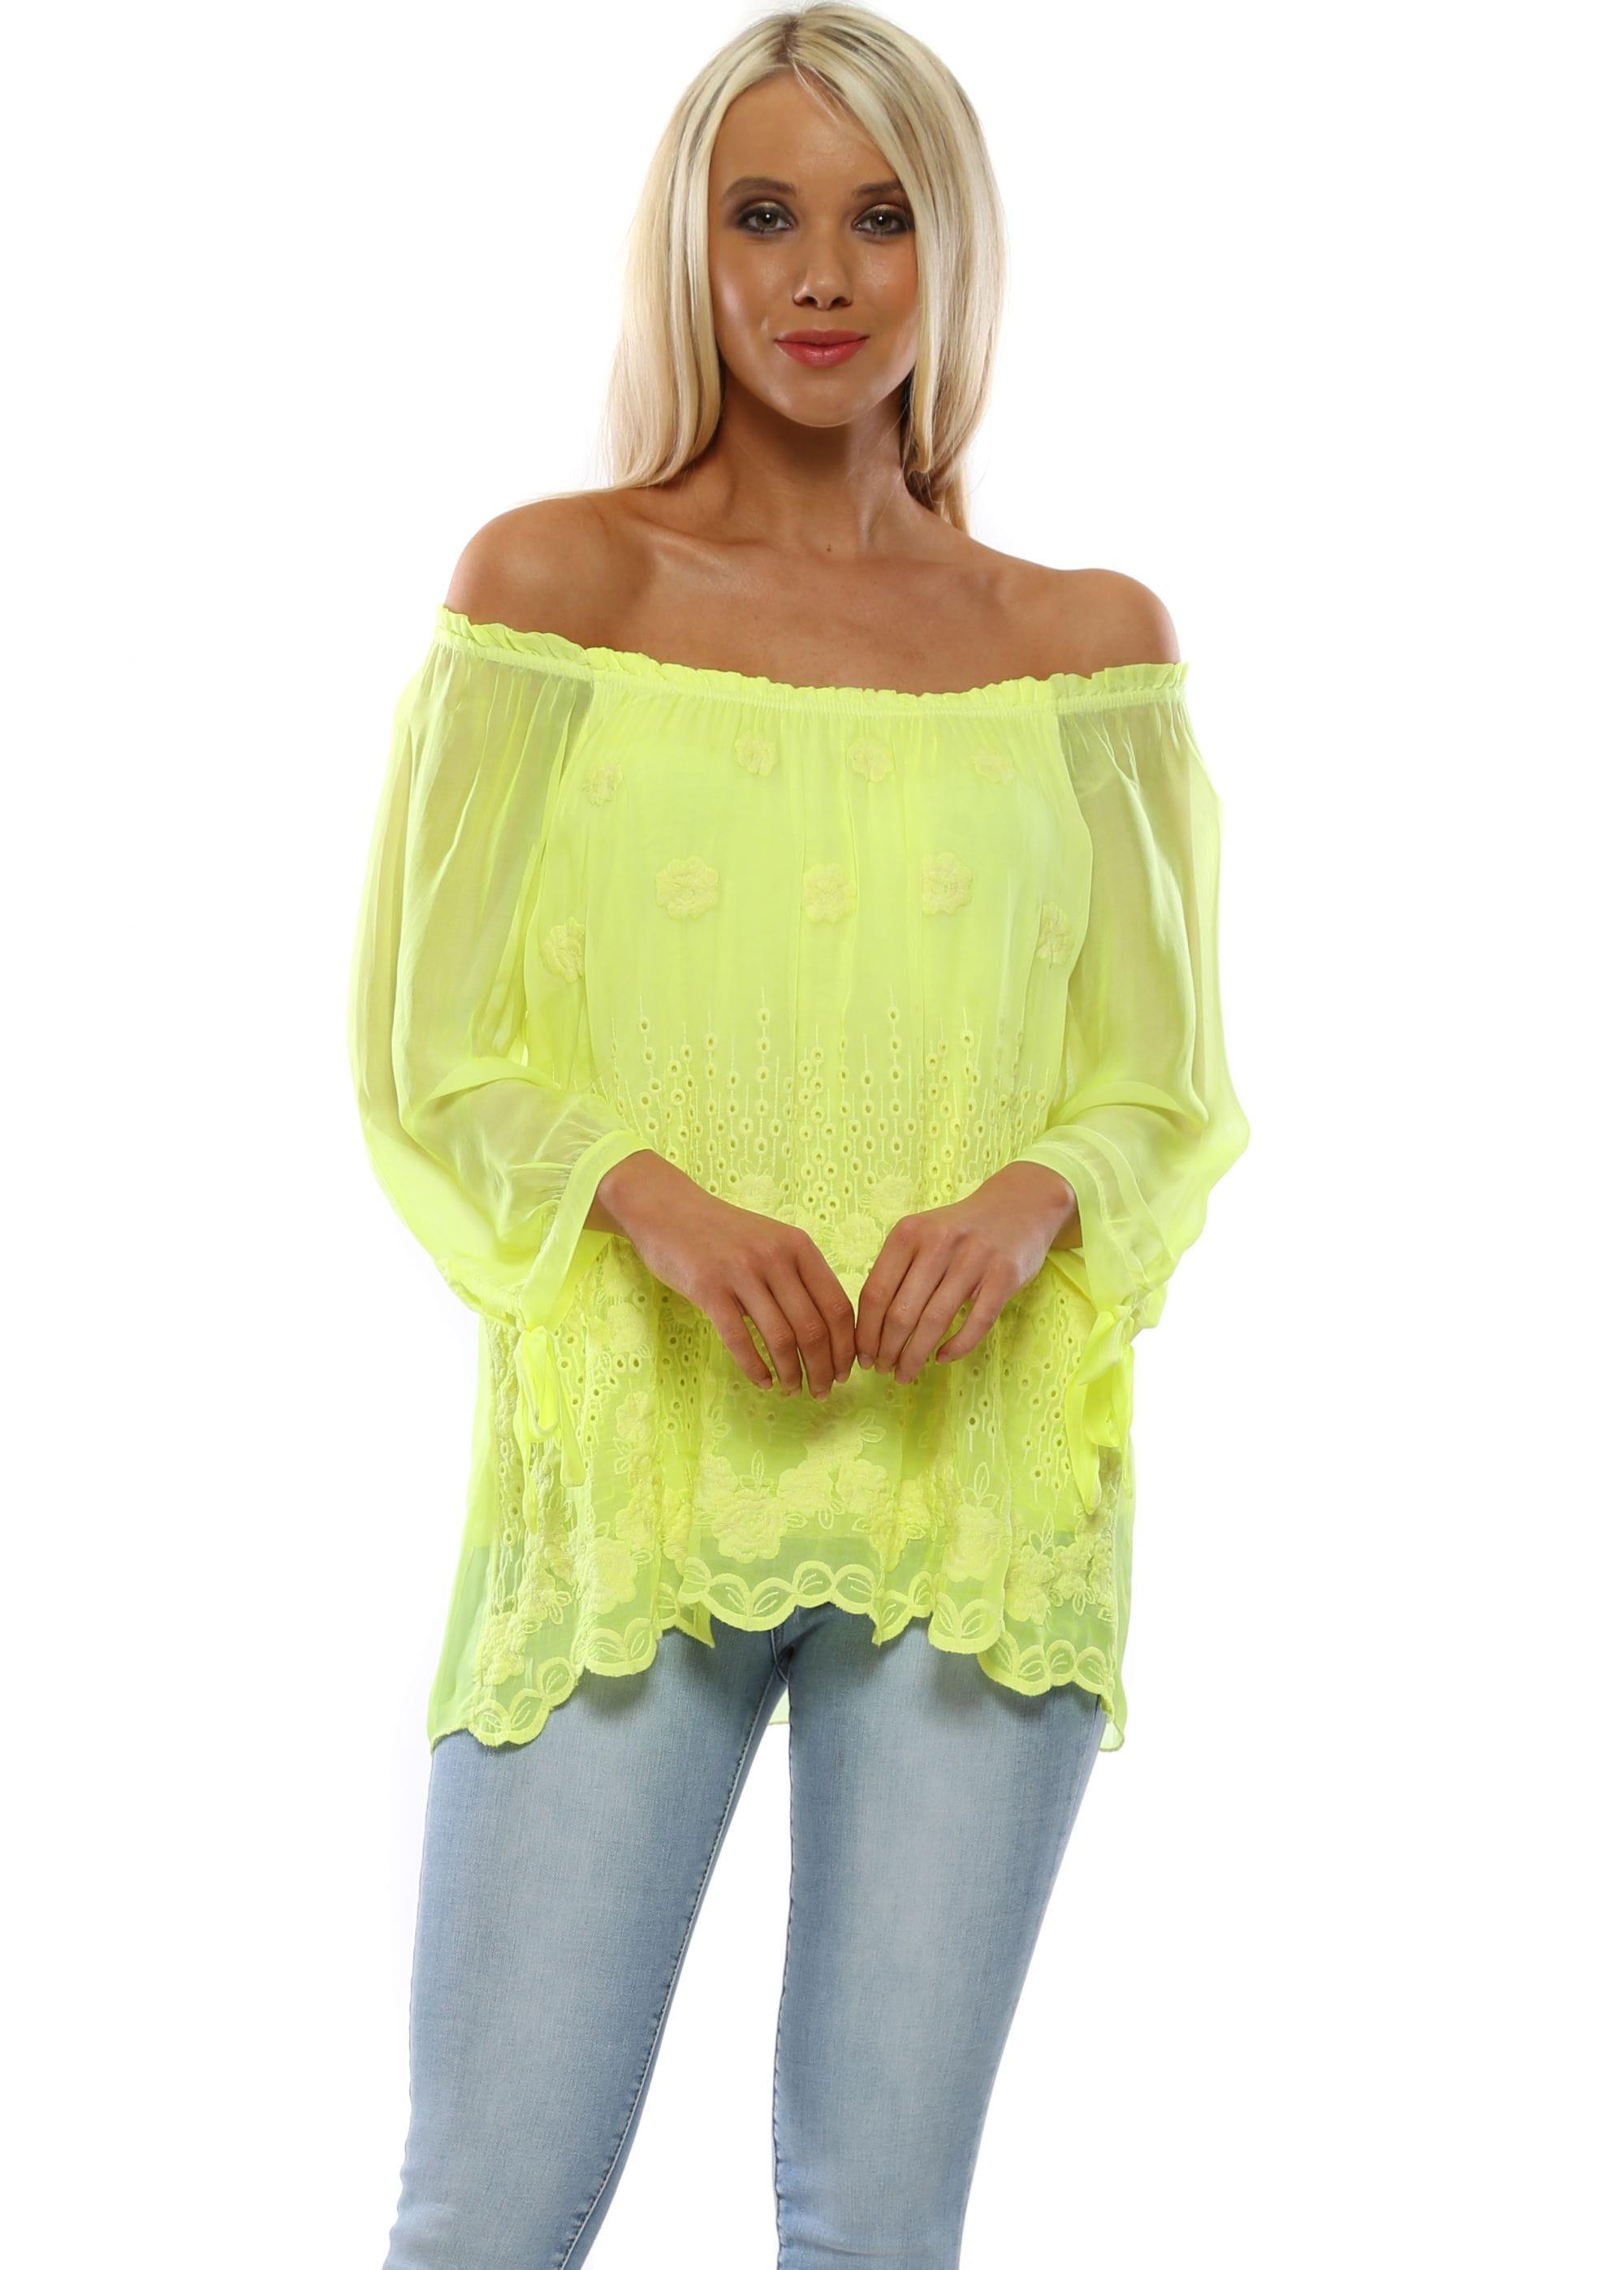 bd3f6ecdca3390 Made In Italy Top   Neon Yellow Top   Designer Desirables